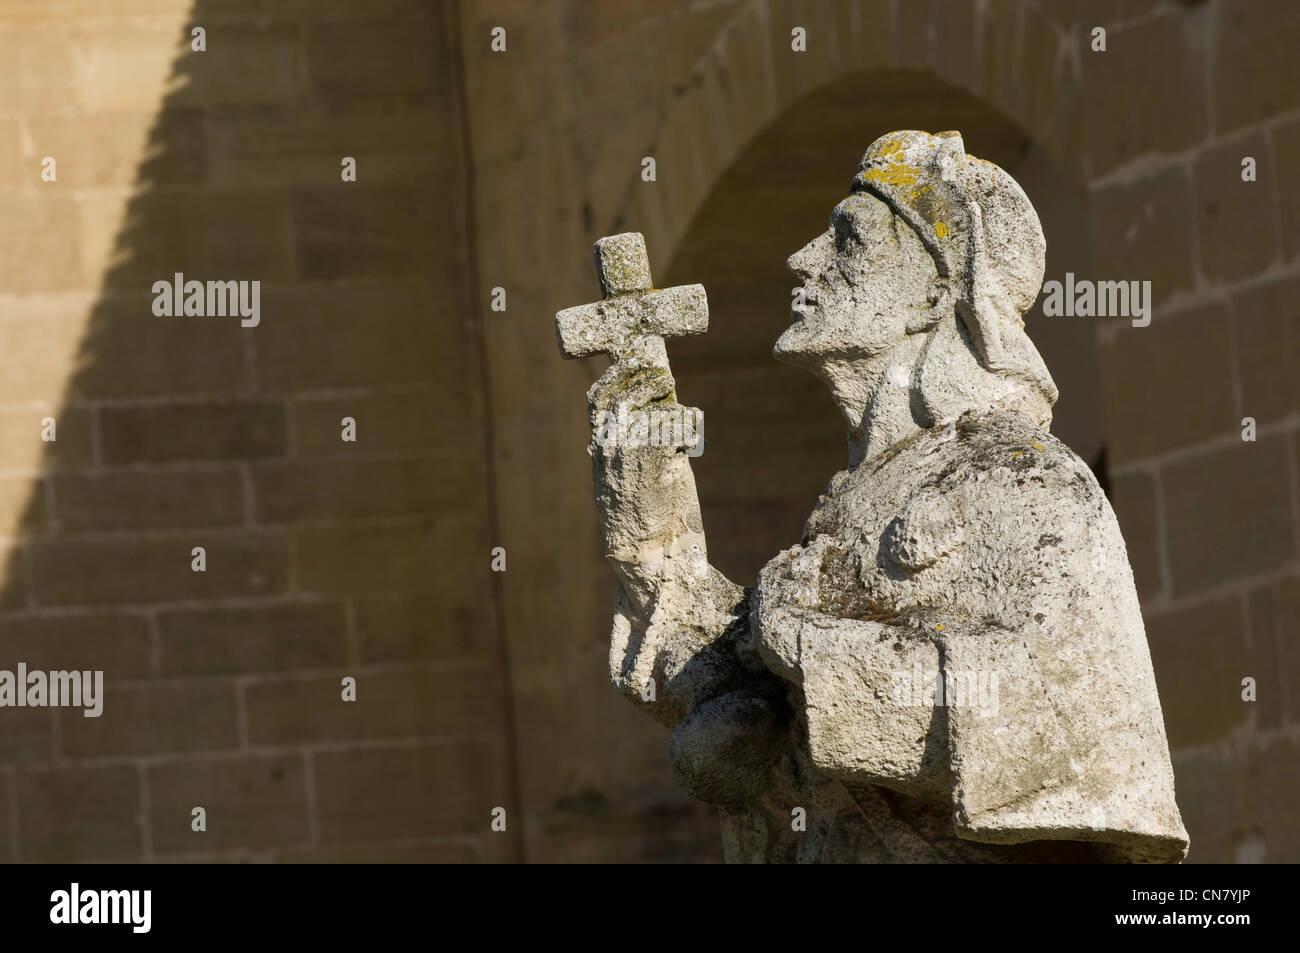 Spain, La Rioja, Santo Domingo de la Calzada, statue of pilgim placed under the protection of Santiago - Stock Image